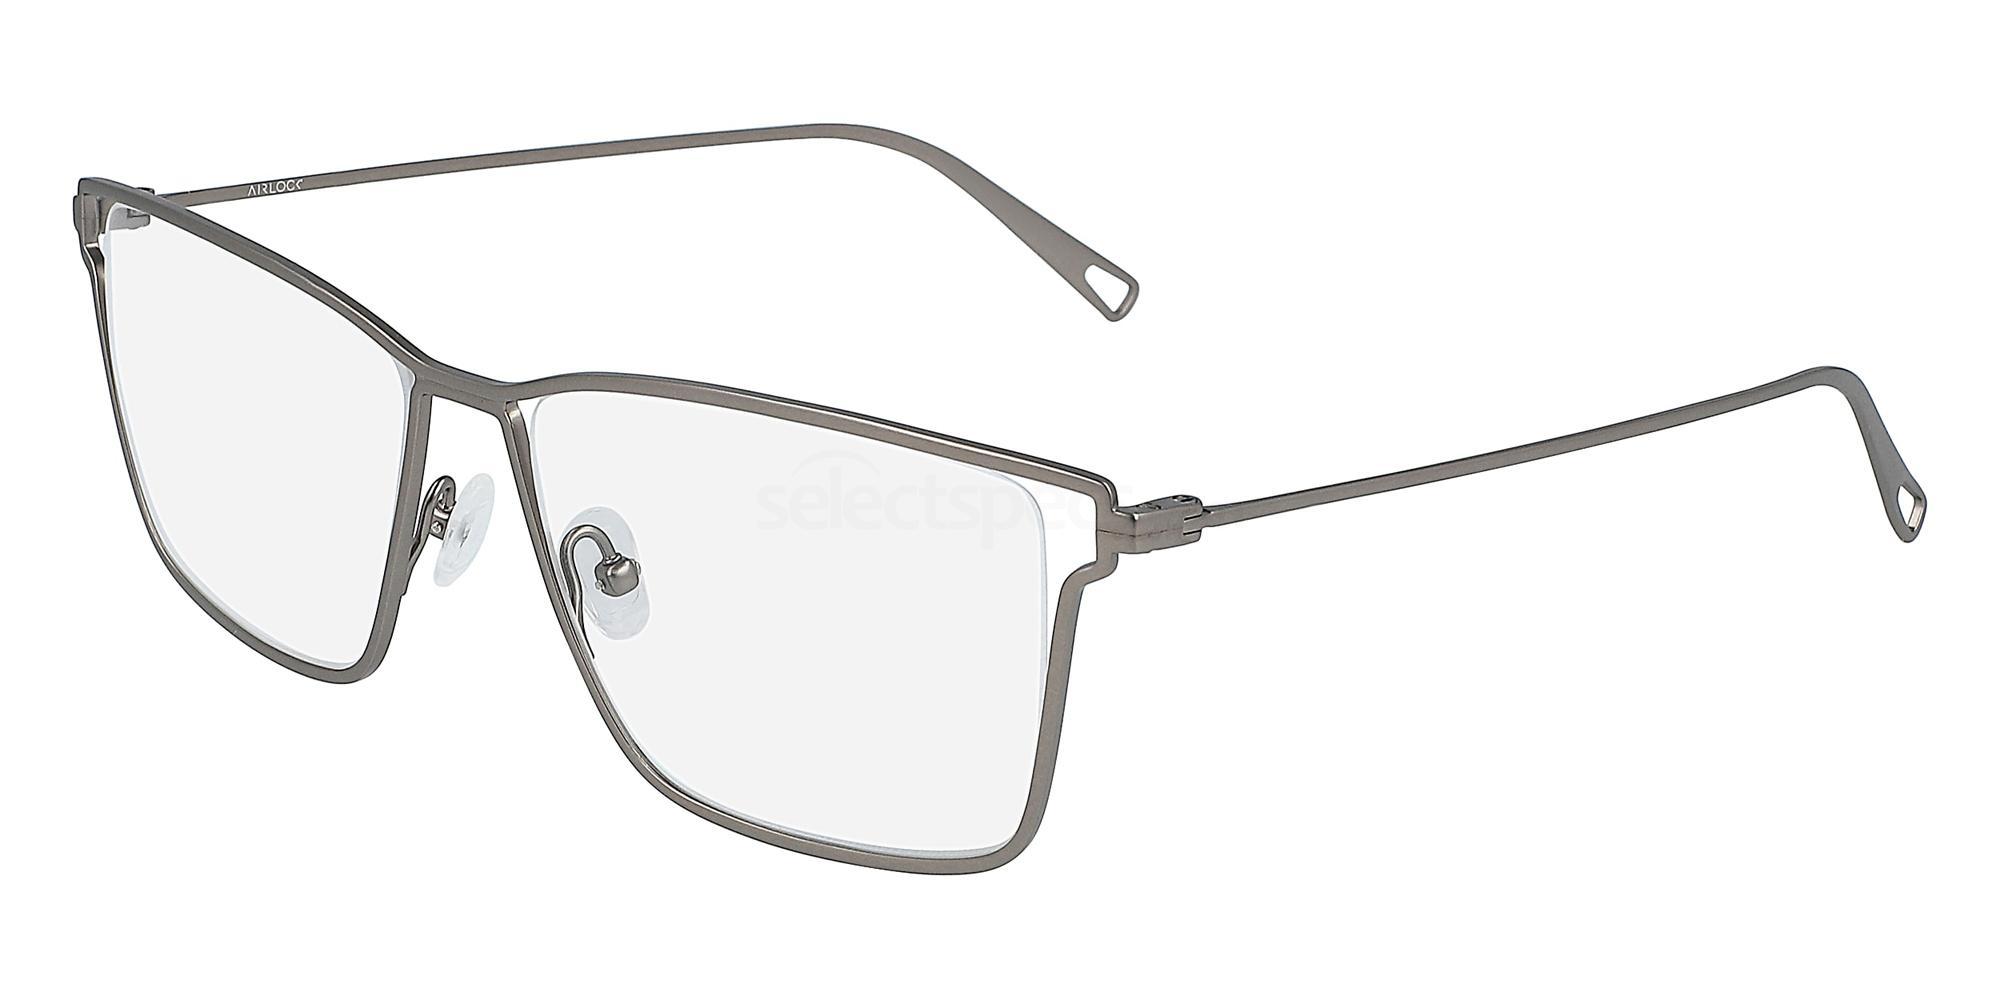 033 AIRLOCK 4000 Glasses, Pure